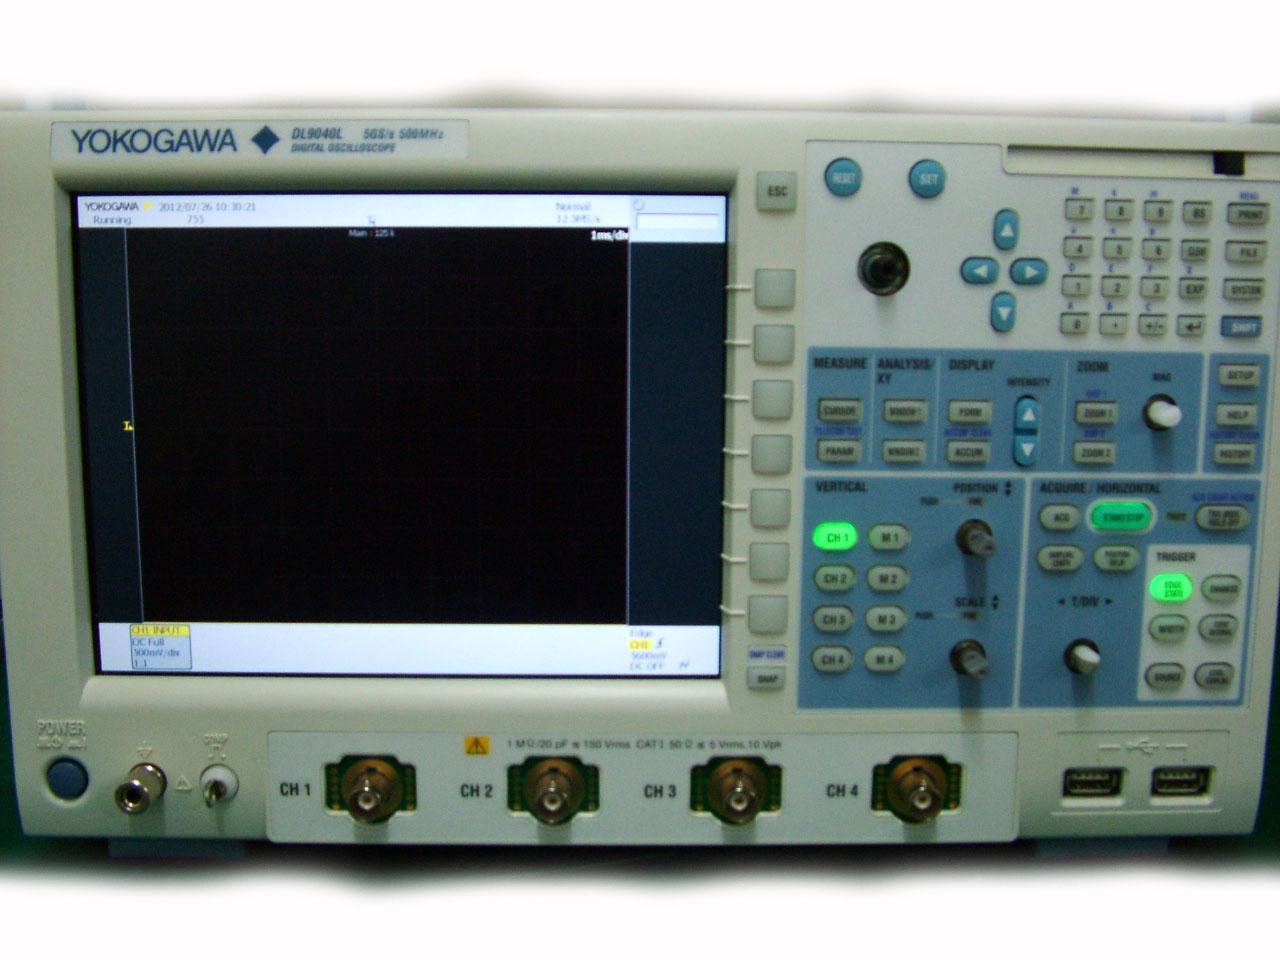 Yokogawa 700440 300Mhz,4Ch, Digital Oscilloscope